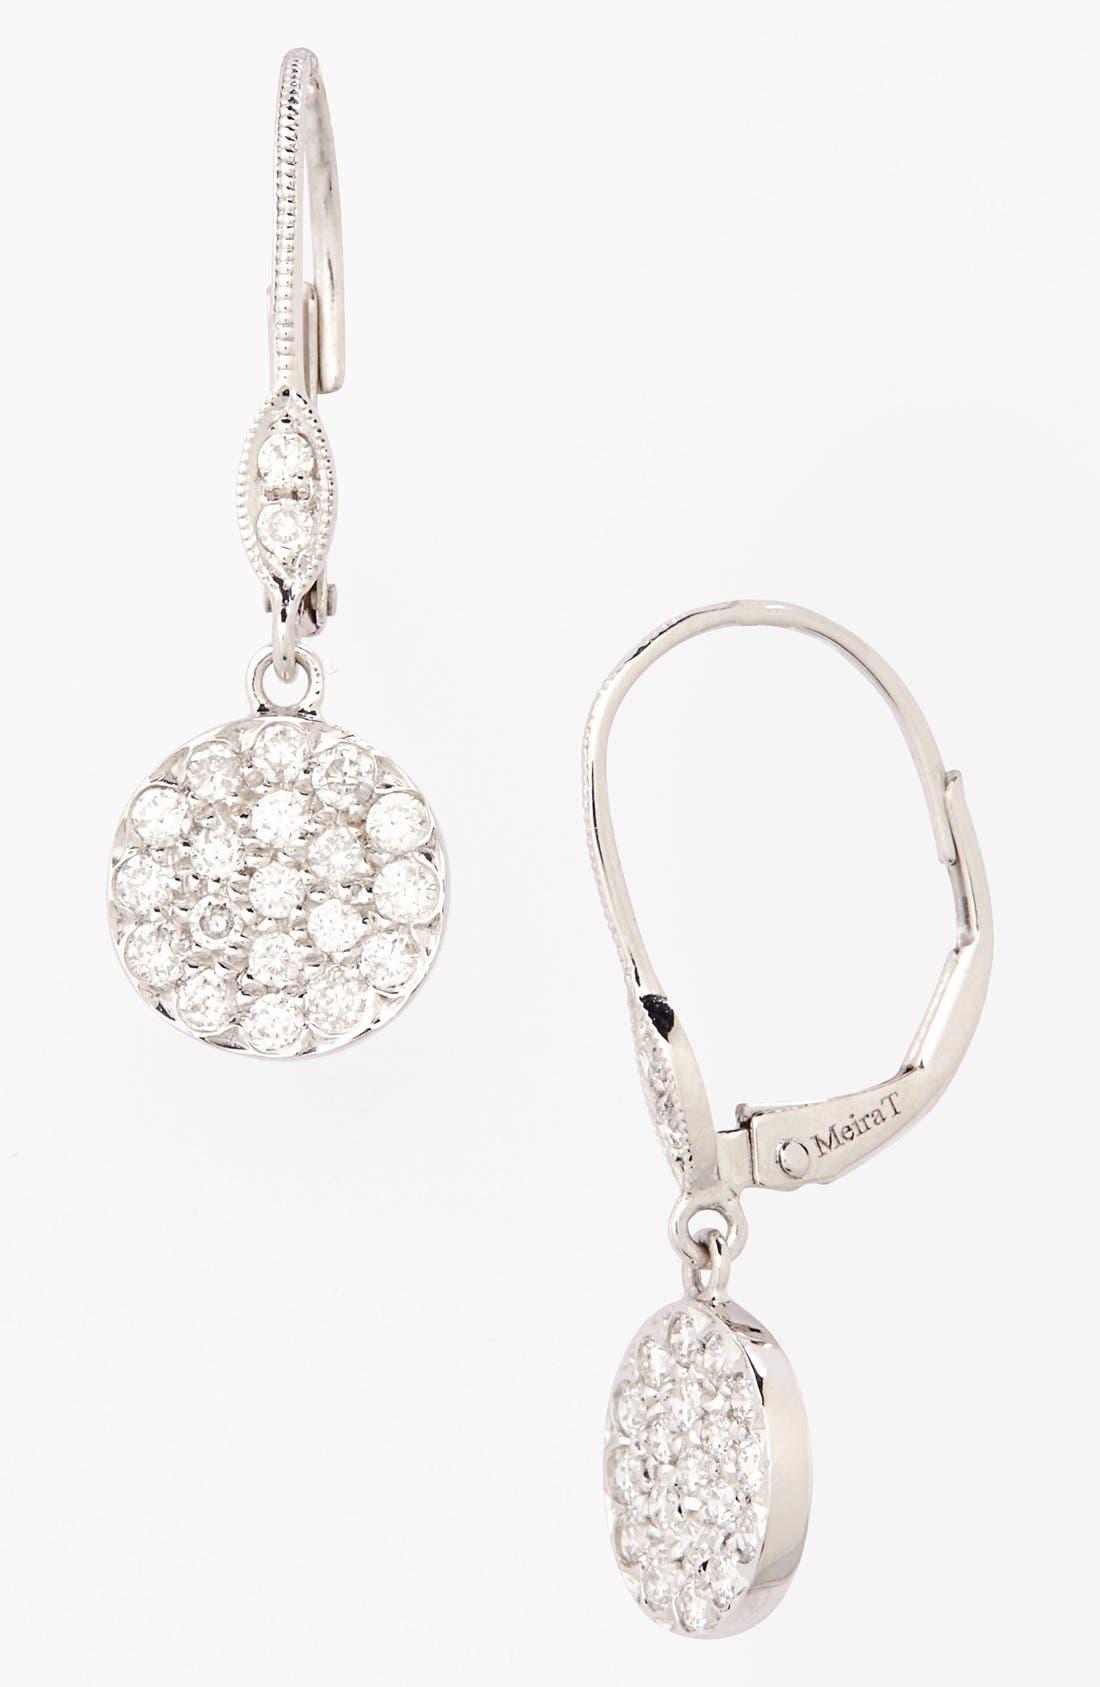 Main Image - MeiraT 'Dazzling' Diamond Disc Drop Earrings